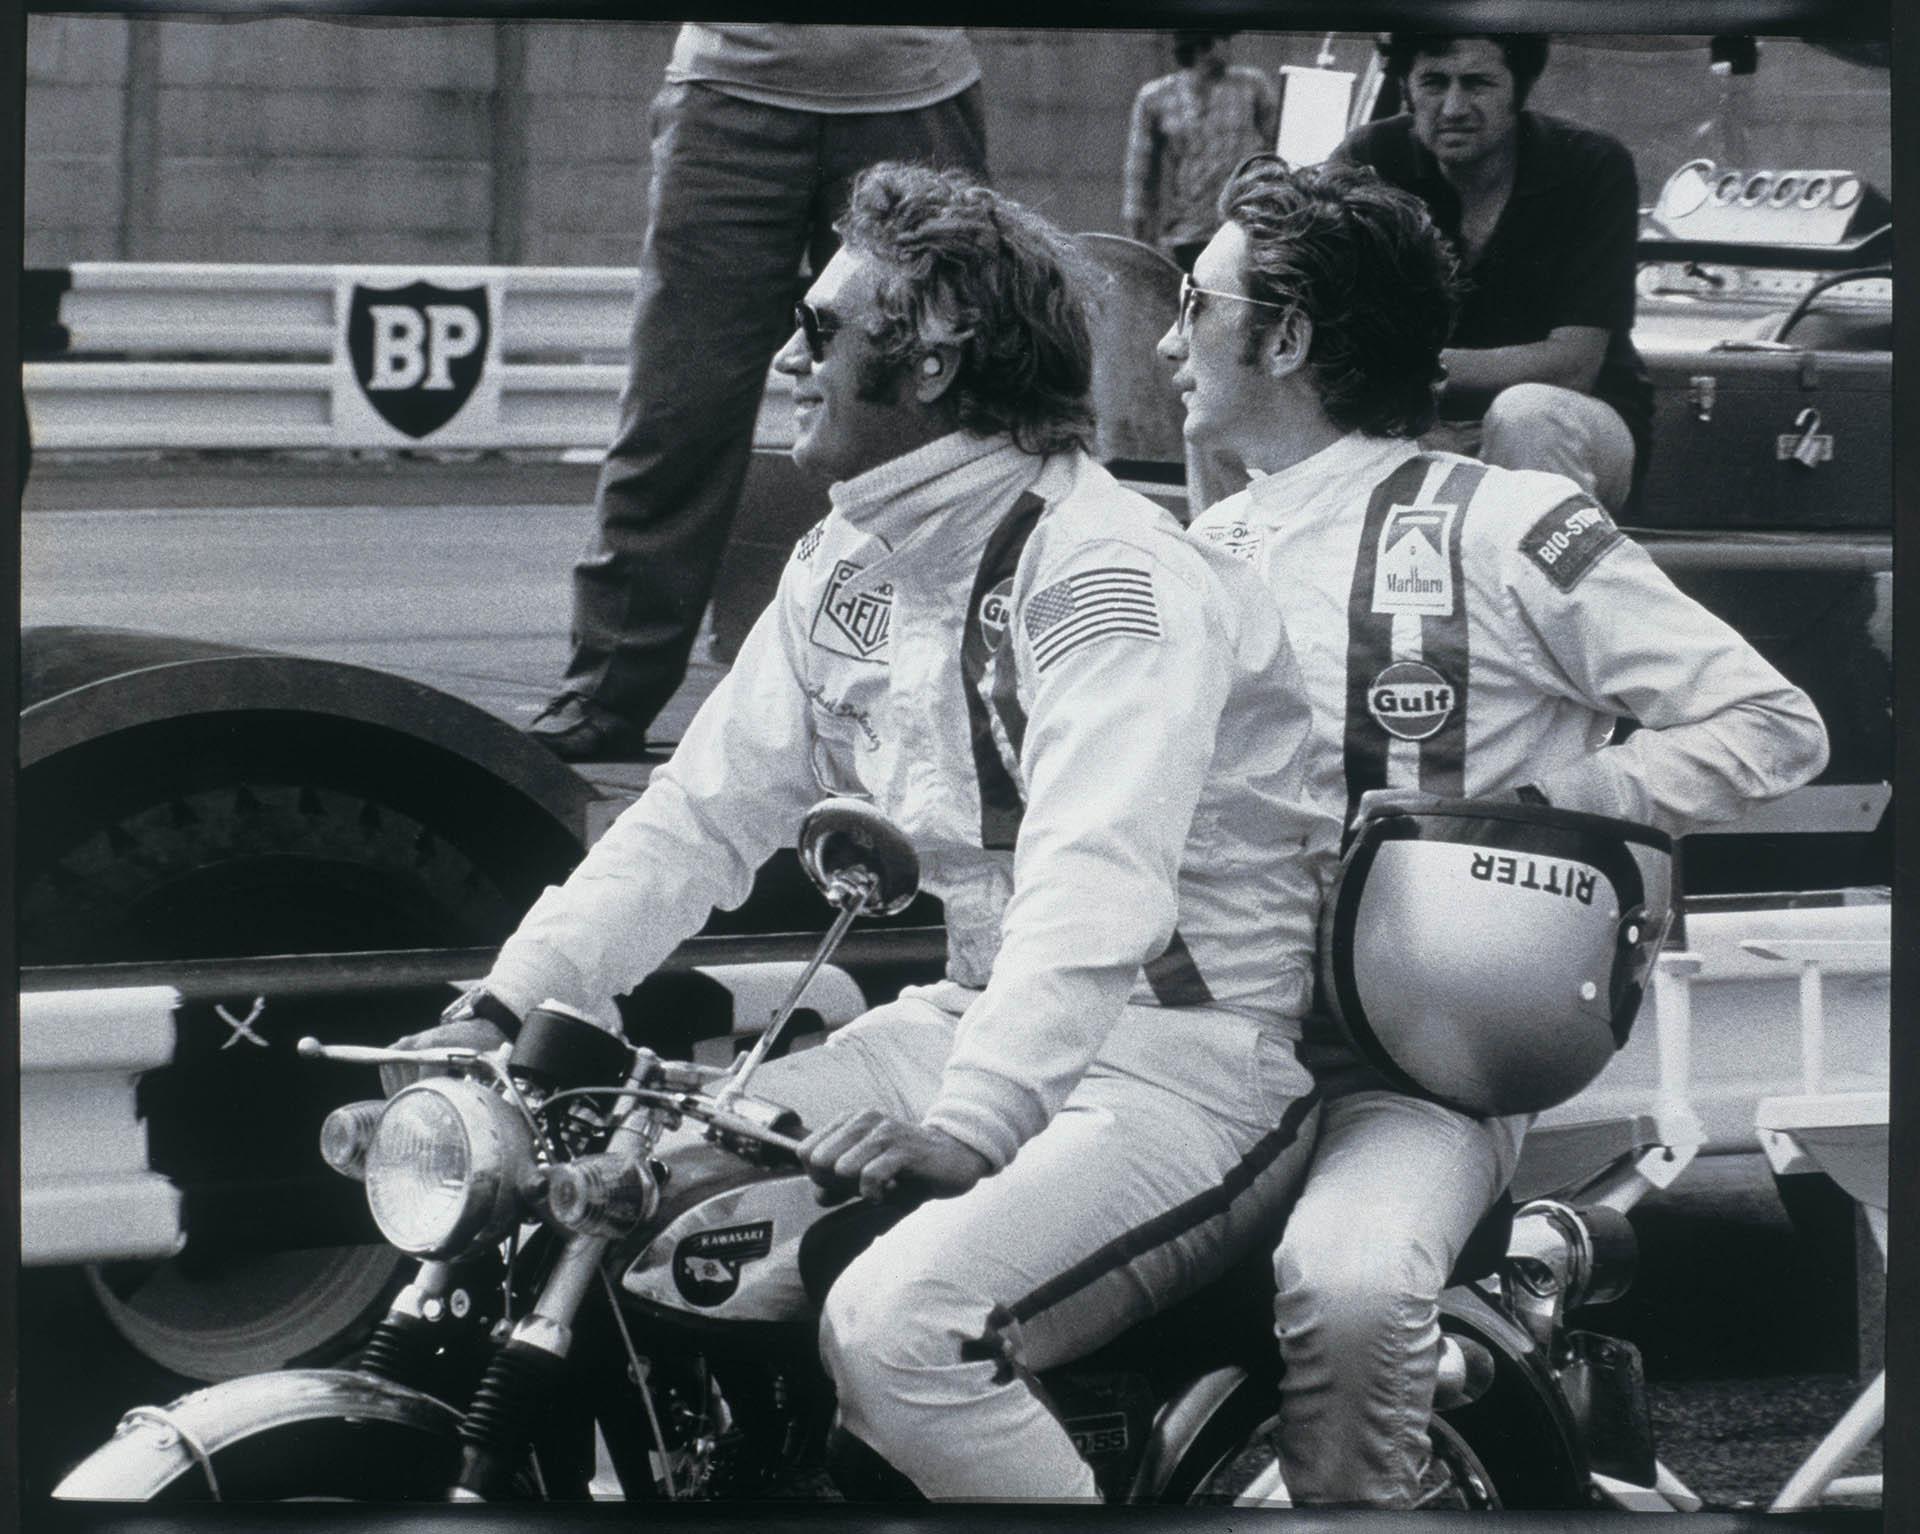 Steve McQueen und Jo Siffert auf Motorrad in Le Mans 1970